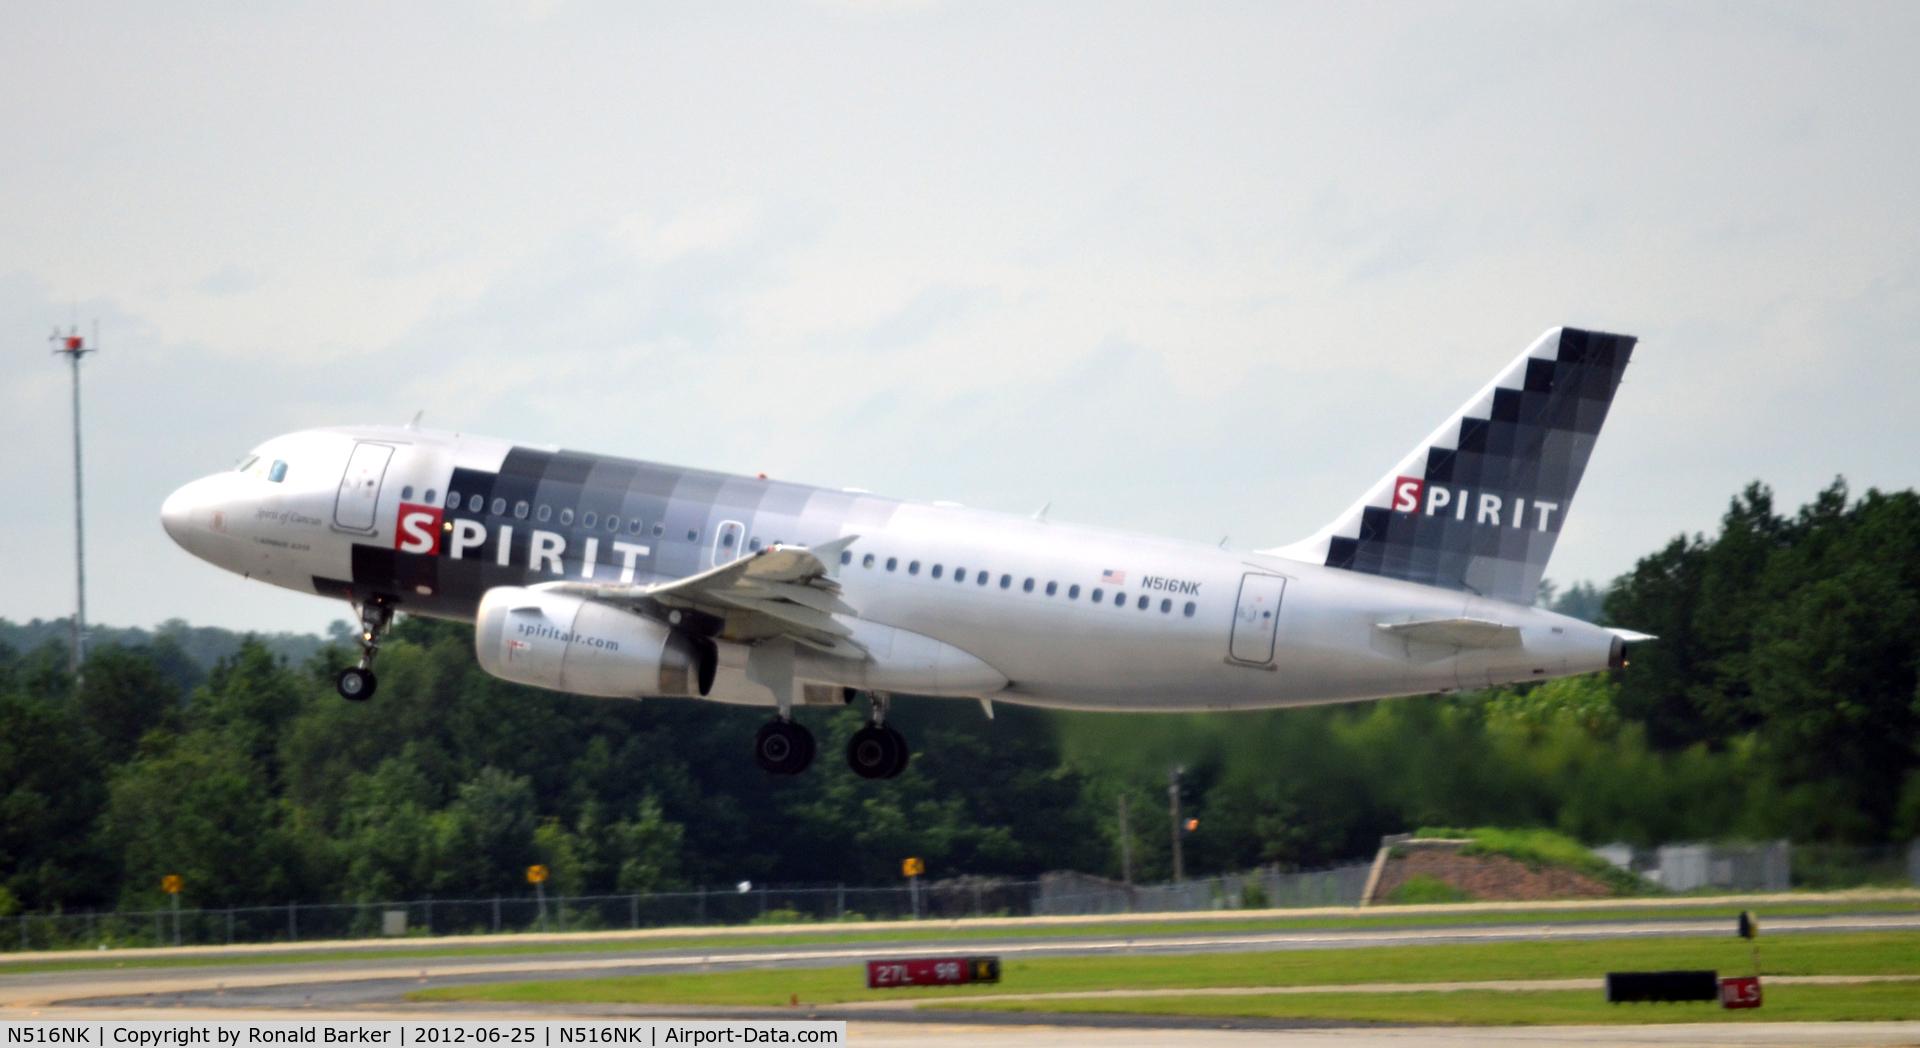 N516NK, 2006 Airbus A319-132 C/N 2704, Takeoff ATL